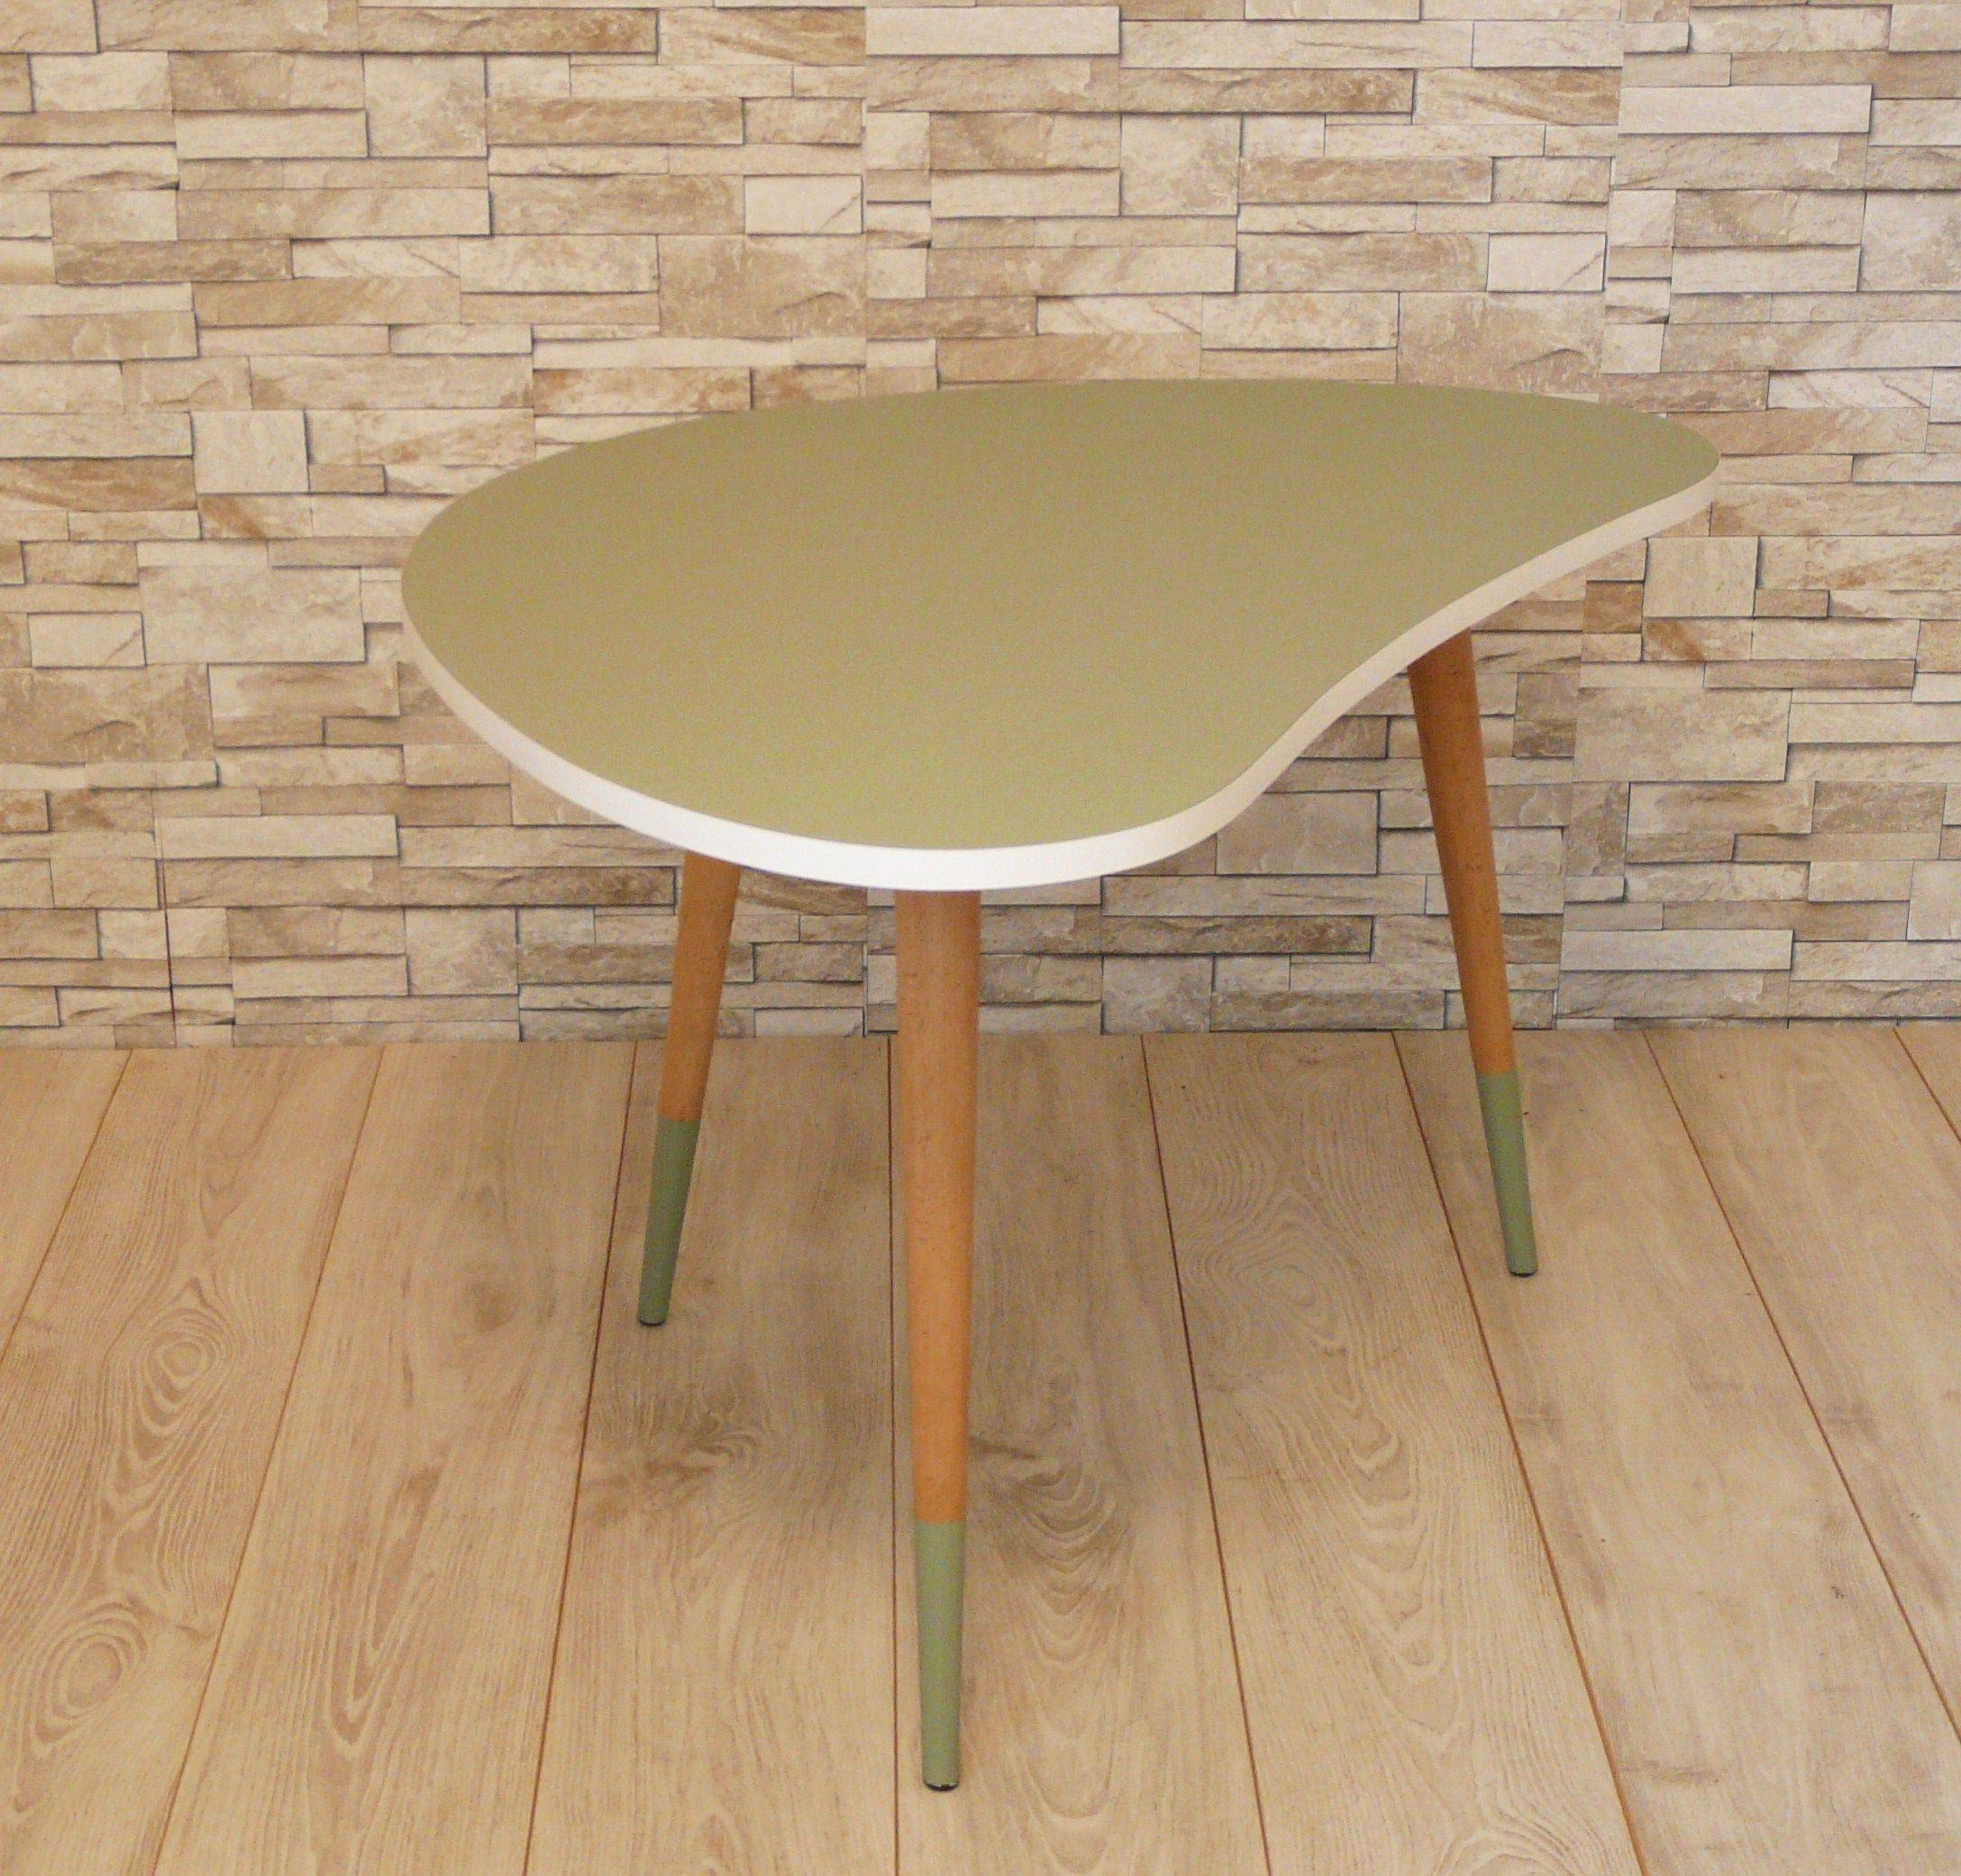 table mi haute haricot 1960 aujourd 39 hui comme avant meuble vintage pinterest haricots. Black Bedroom Furniture Sets. Home Design Ideas